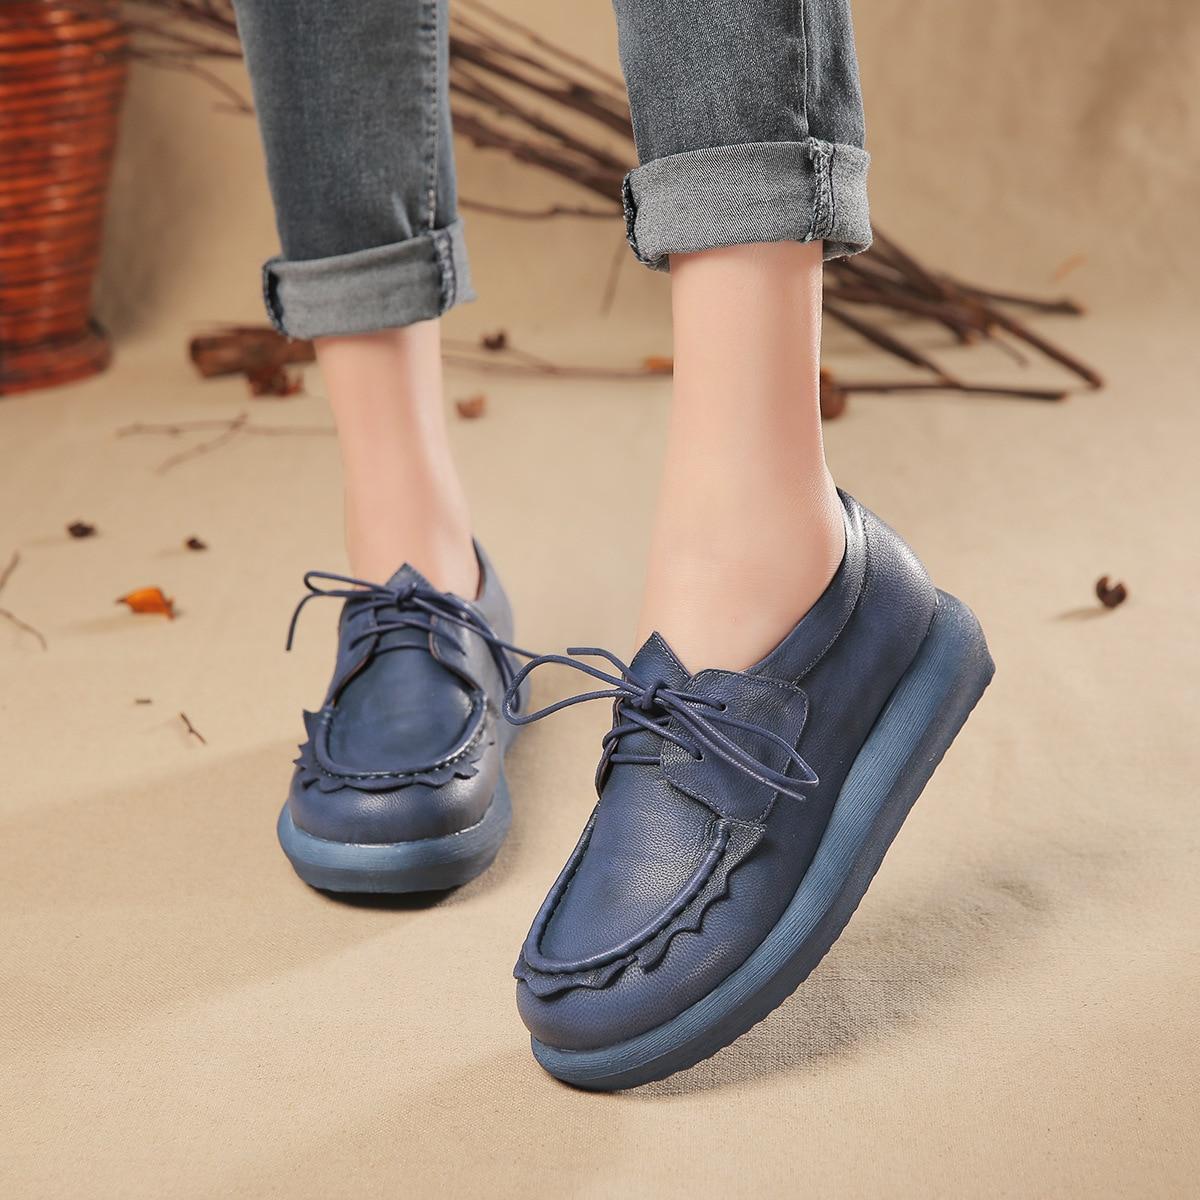 ФОТО Original vintage women flat shoes sheepskin medium heel women lacing shoes platform leather womens shoes flats 2017